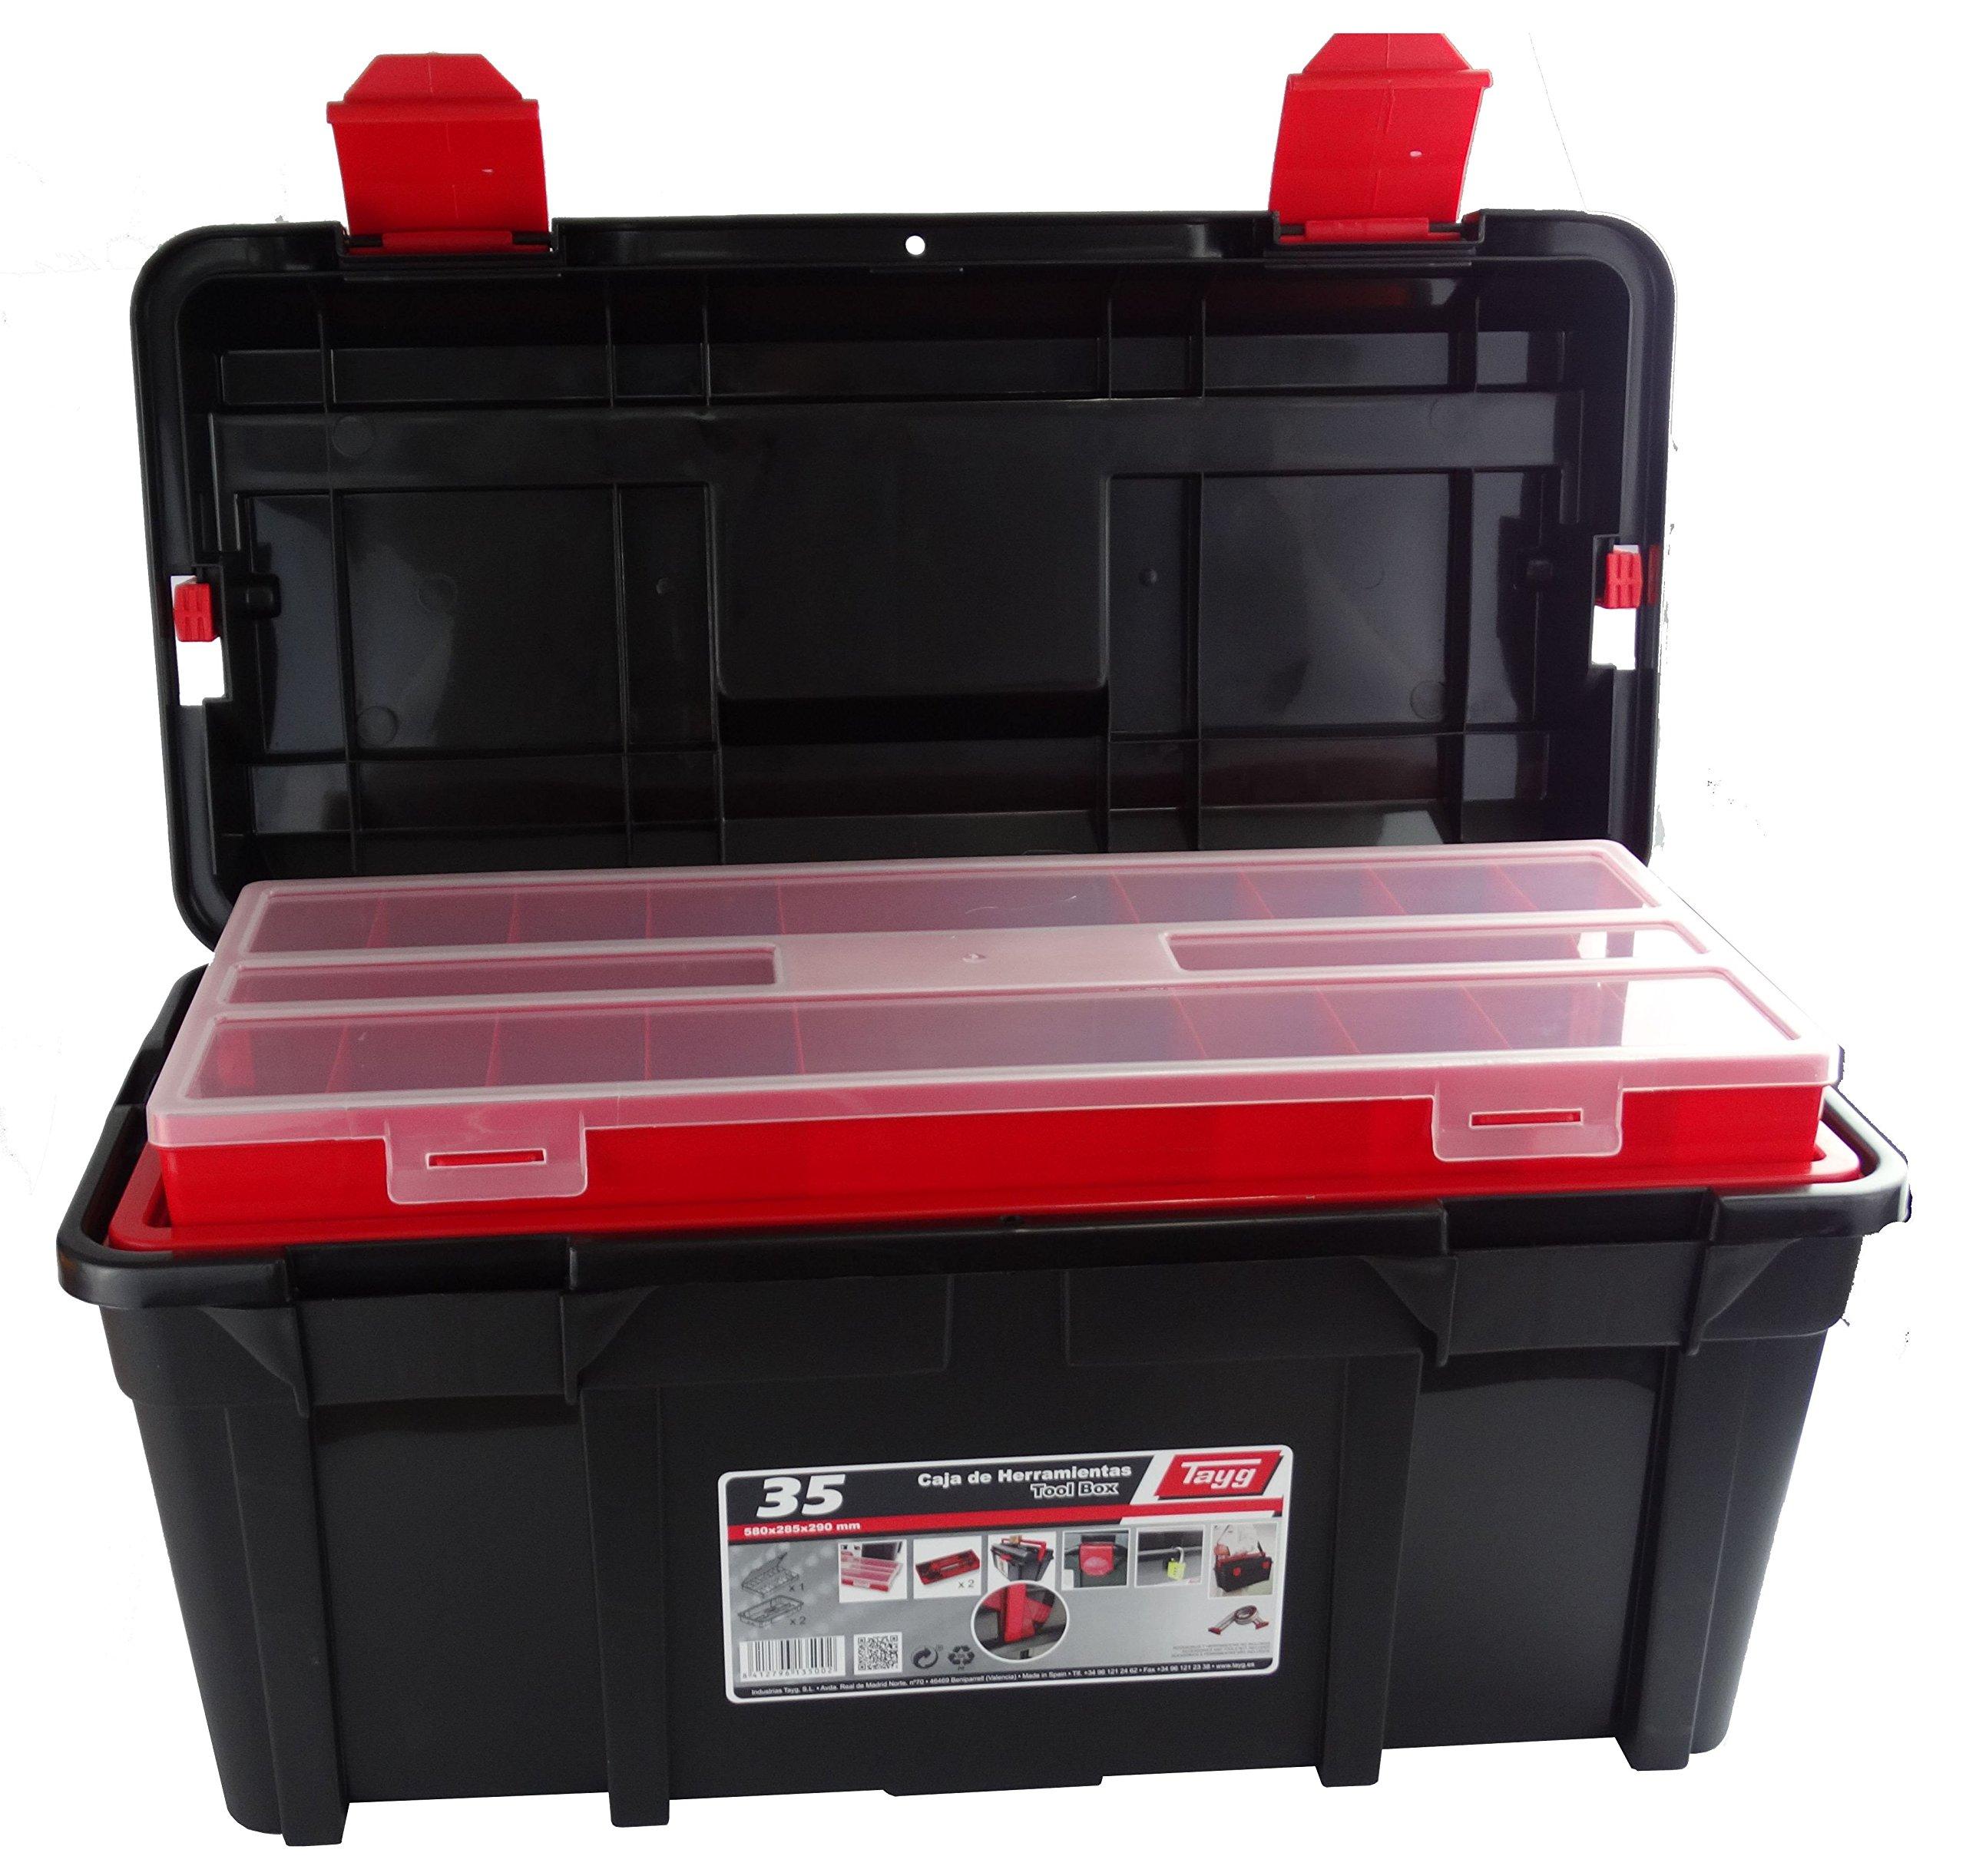 Tayg - Caja herramientas plástico nº 35 product image